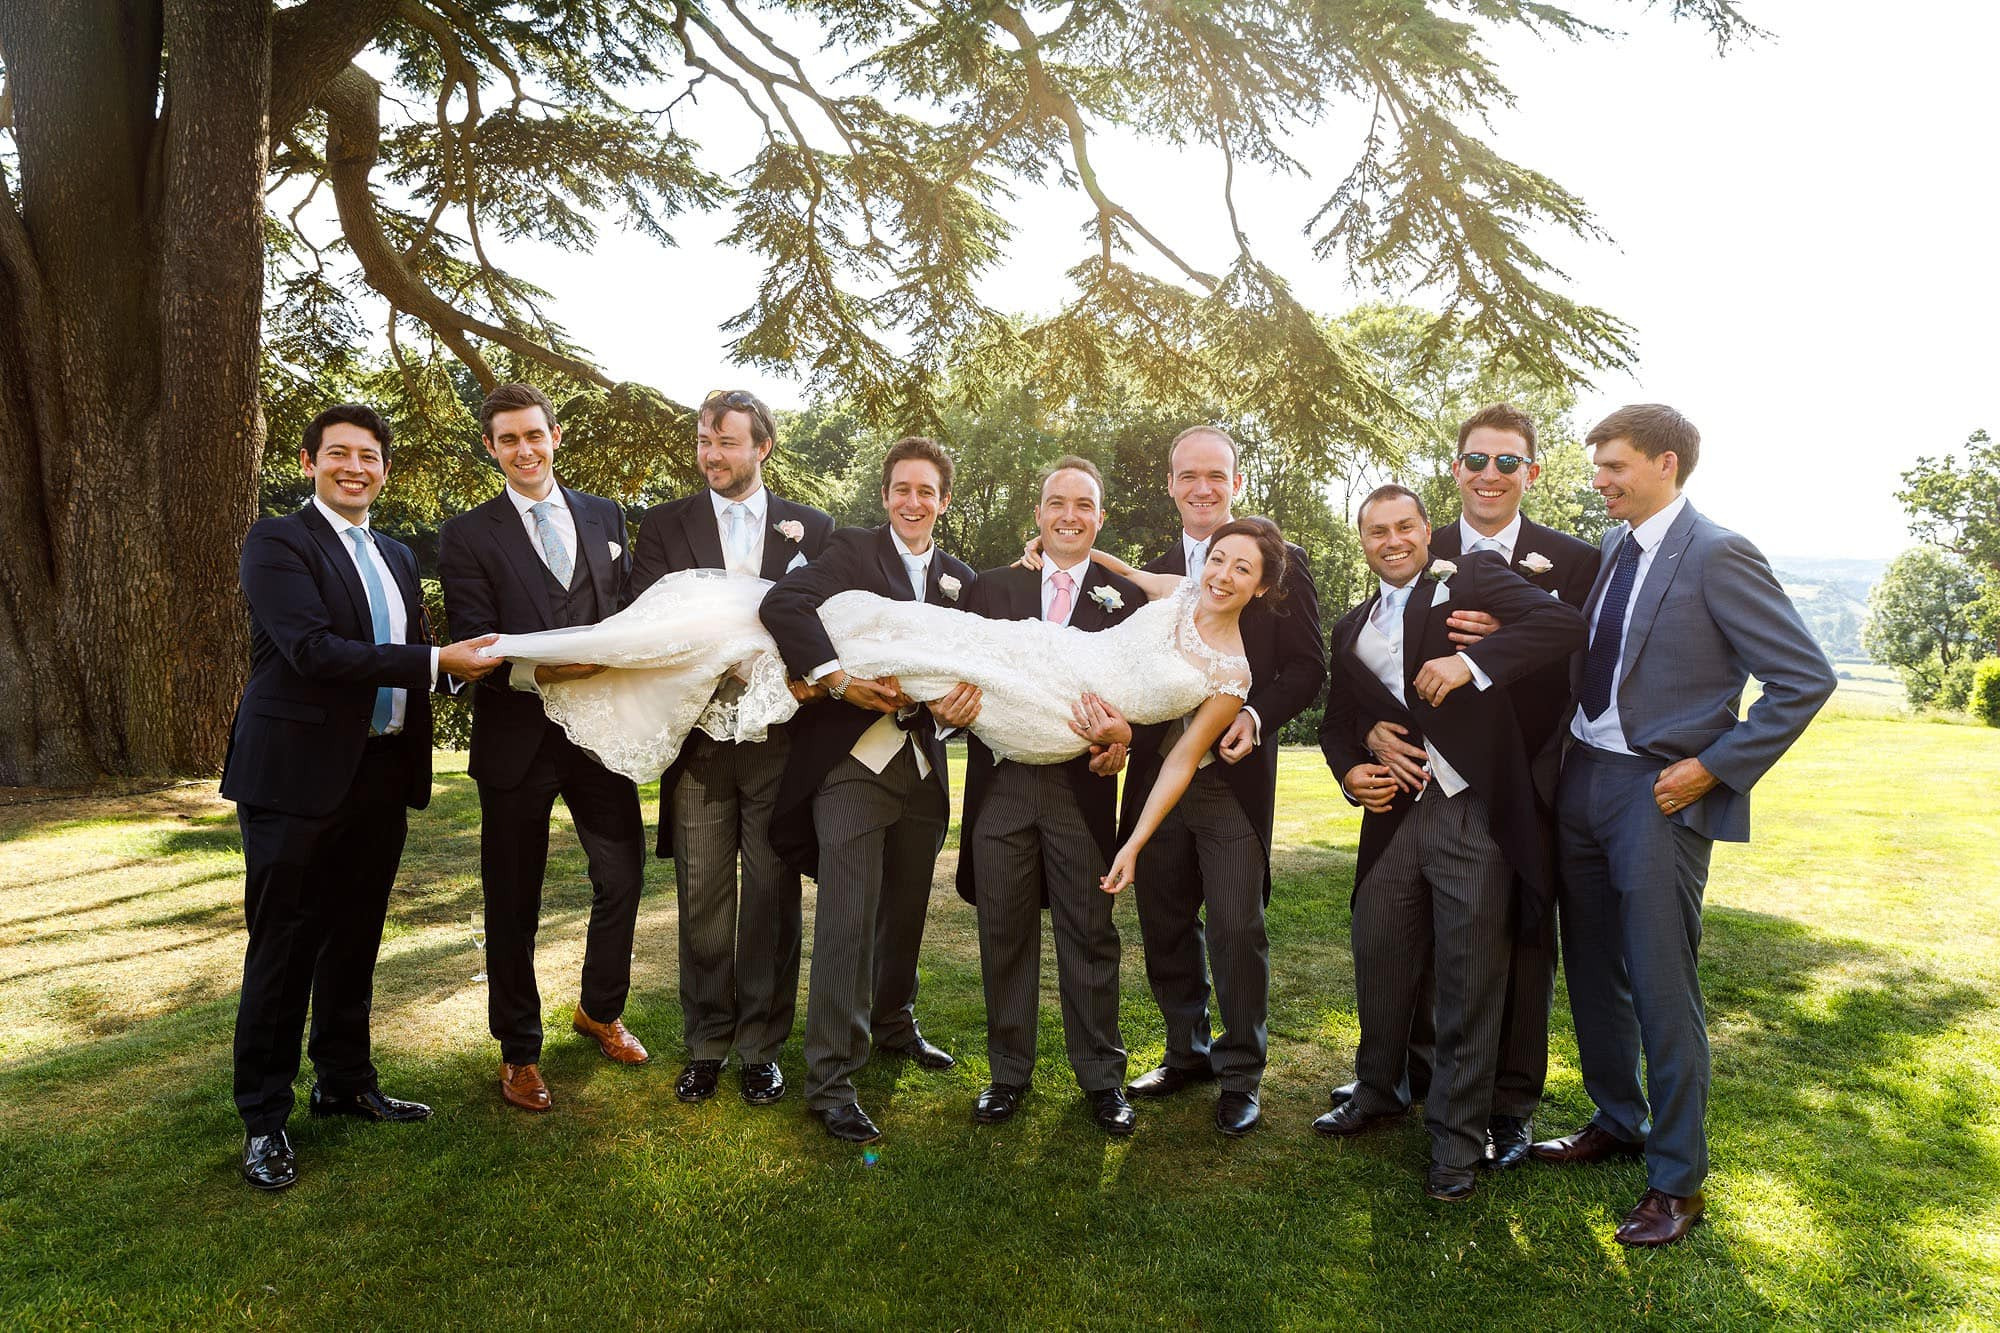 Hedsor wedding photographer